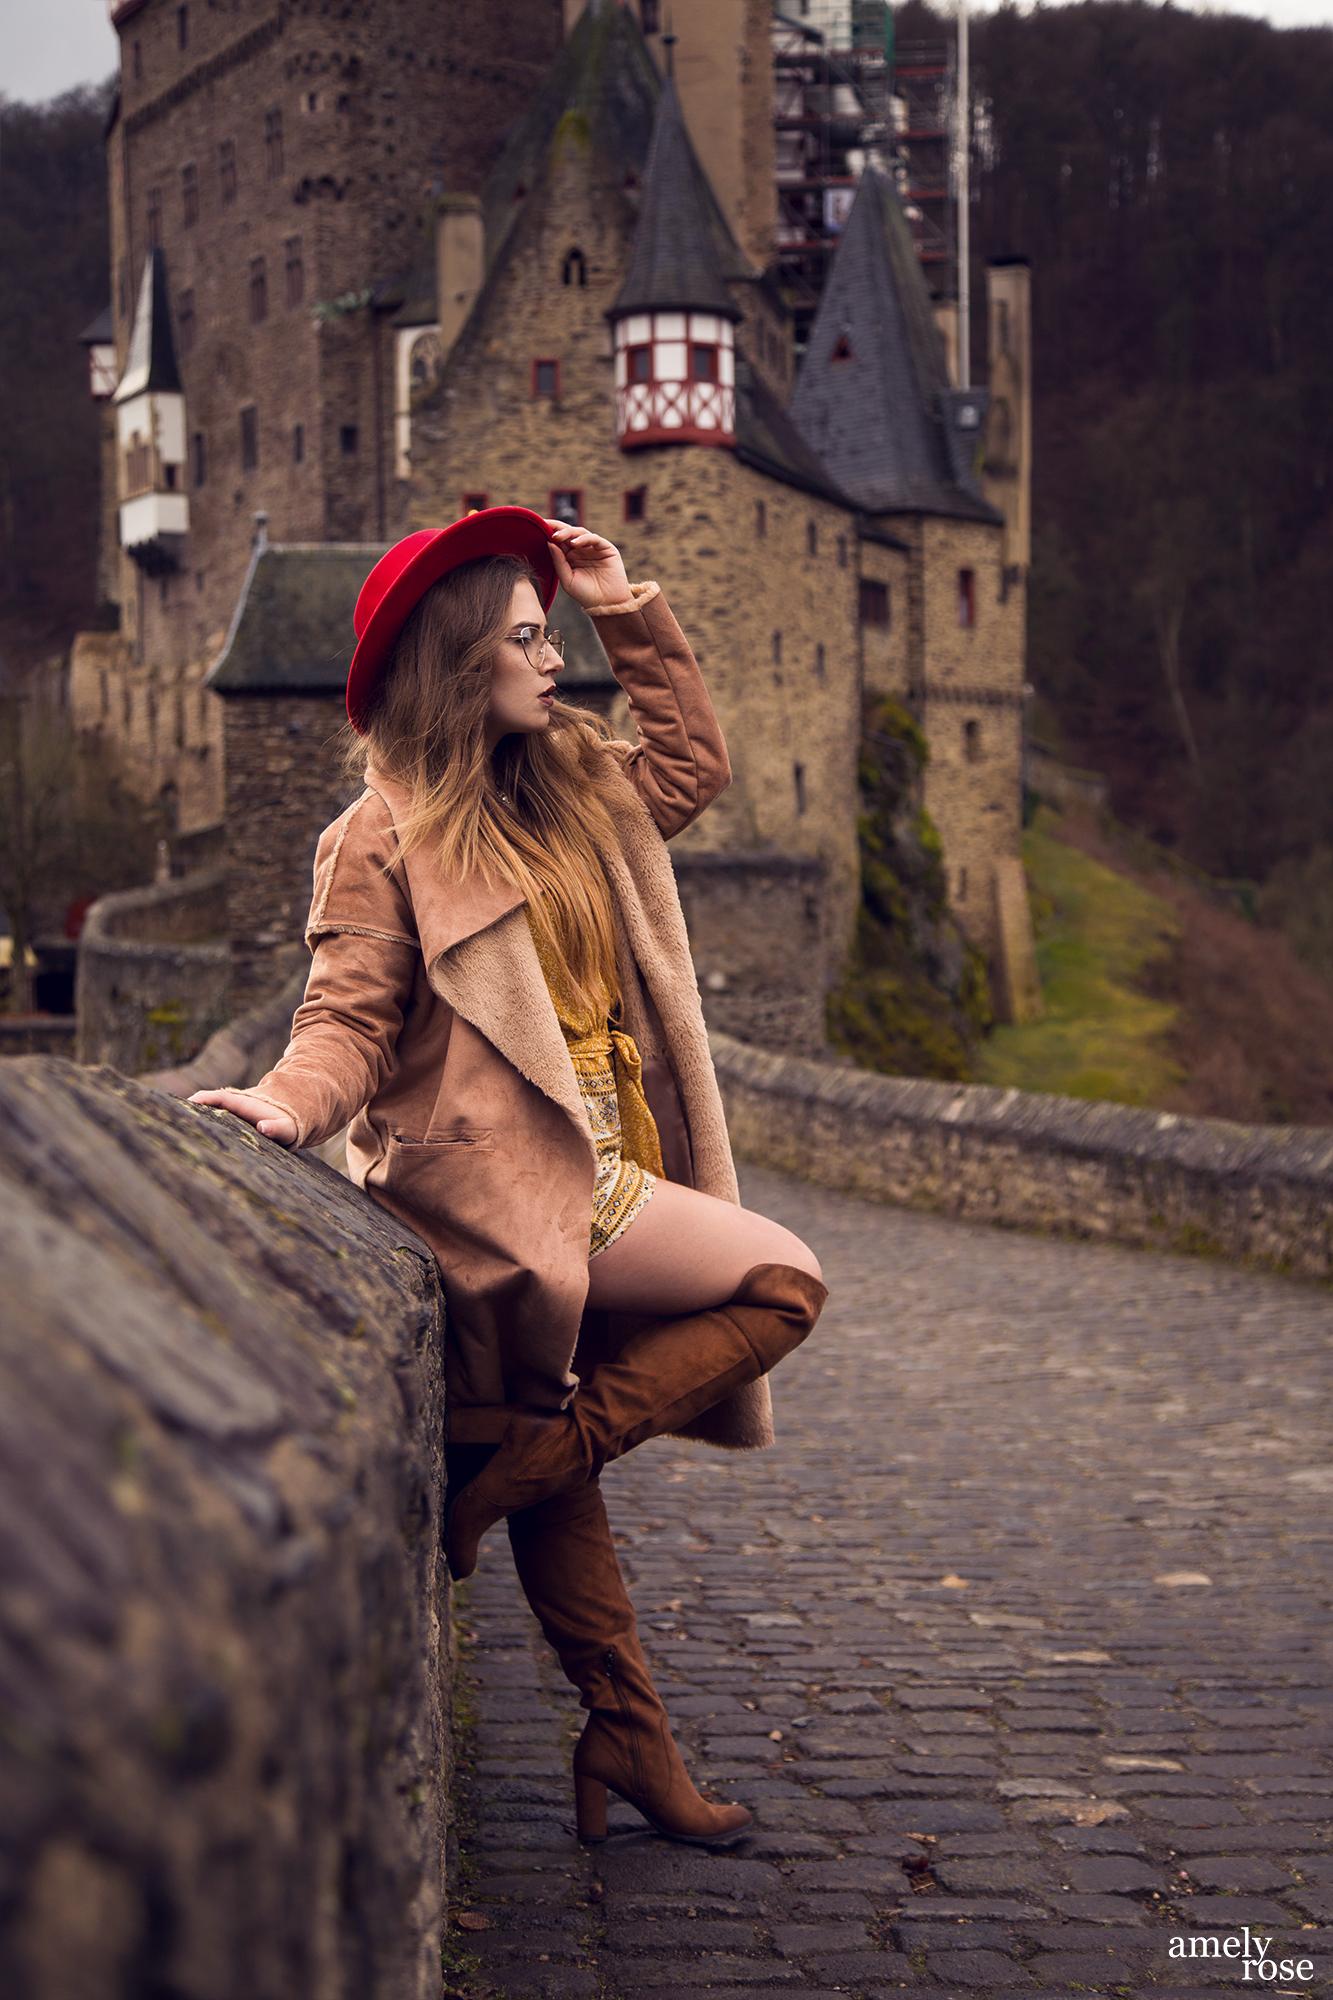 amelyrose, amely rose, amely-rose, fashionblogger, autumnlook, festival, festivals, festivalfashion, festivaloutfit, hippie, boho, summeroutfit, hippieoutfit, festivallook, festivalstyle, fashiongirl, lookbook, look, fashionblogger_de, bloggerlife, fashionlook, mode, modeblogger, germanblogger, zara, architecture, burgeltz, eltzcastle, casleeltz